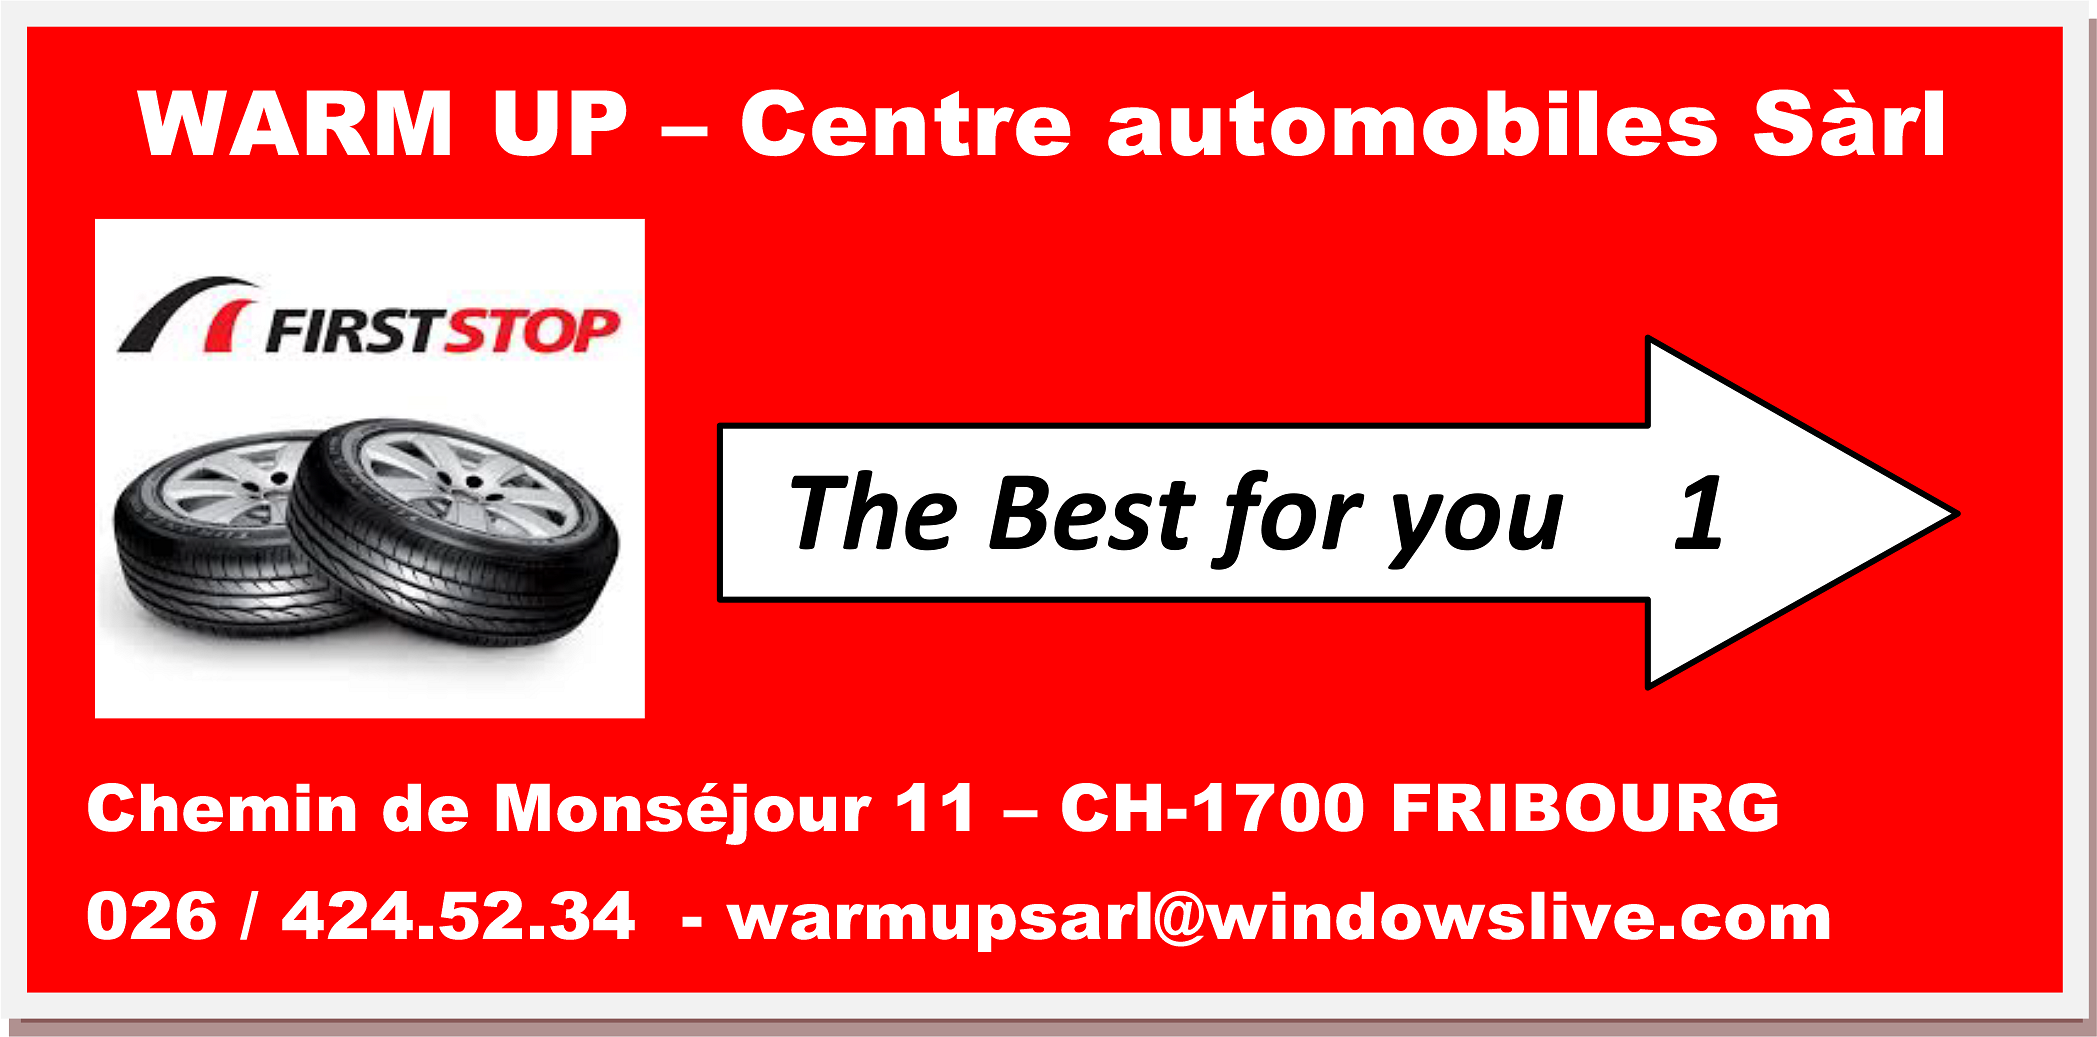 WARM UP Centre automobiles Emery P.